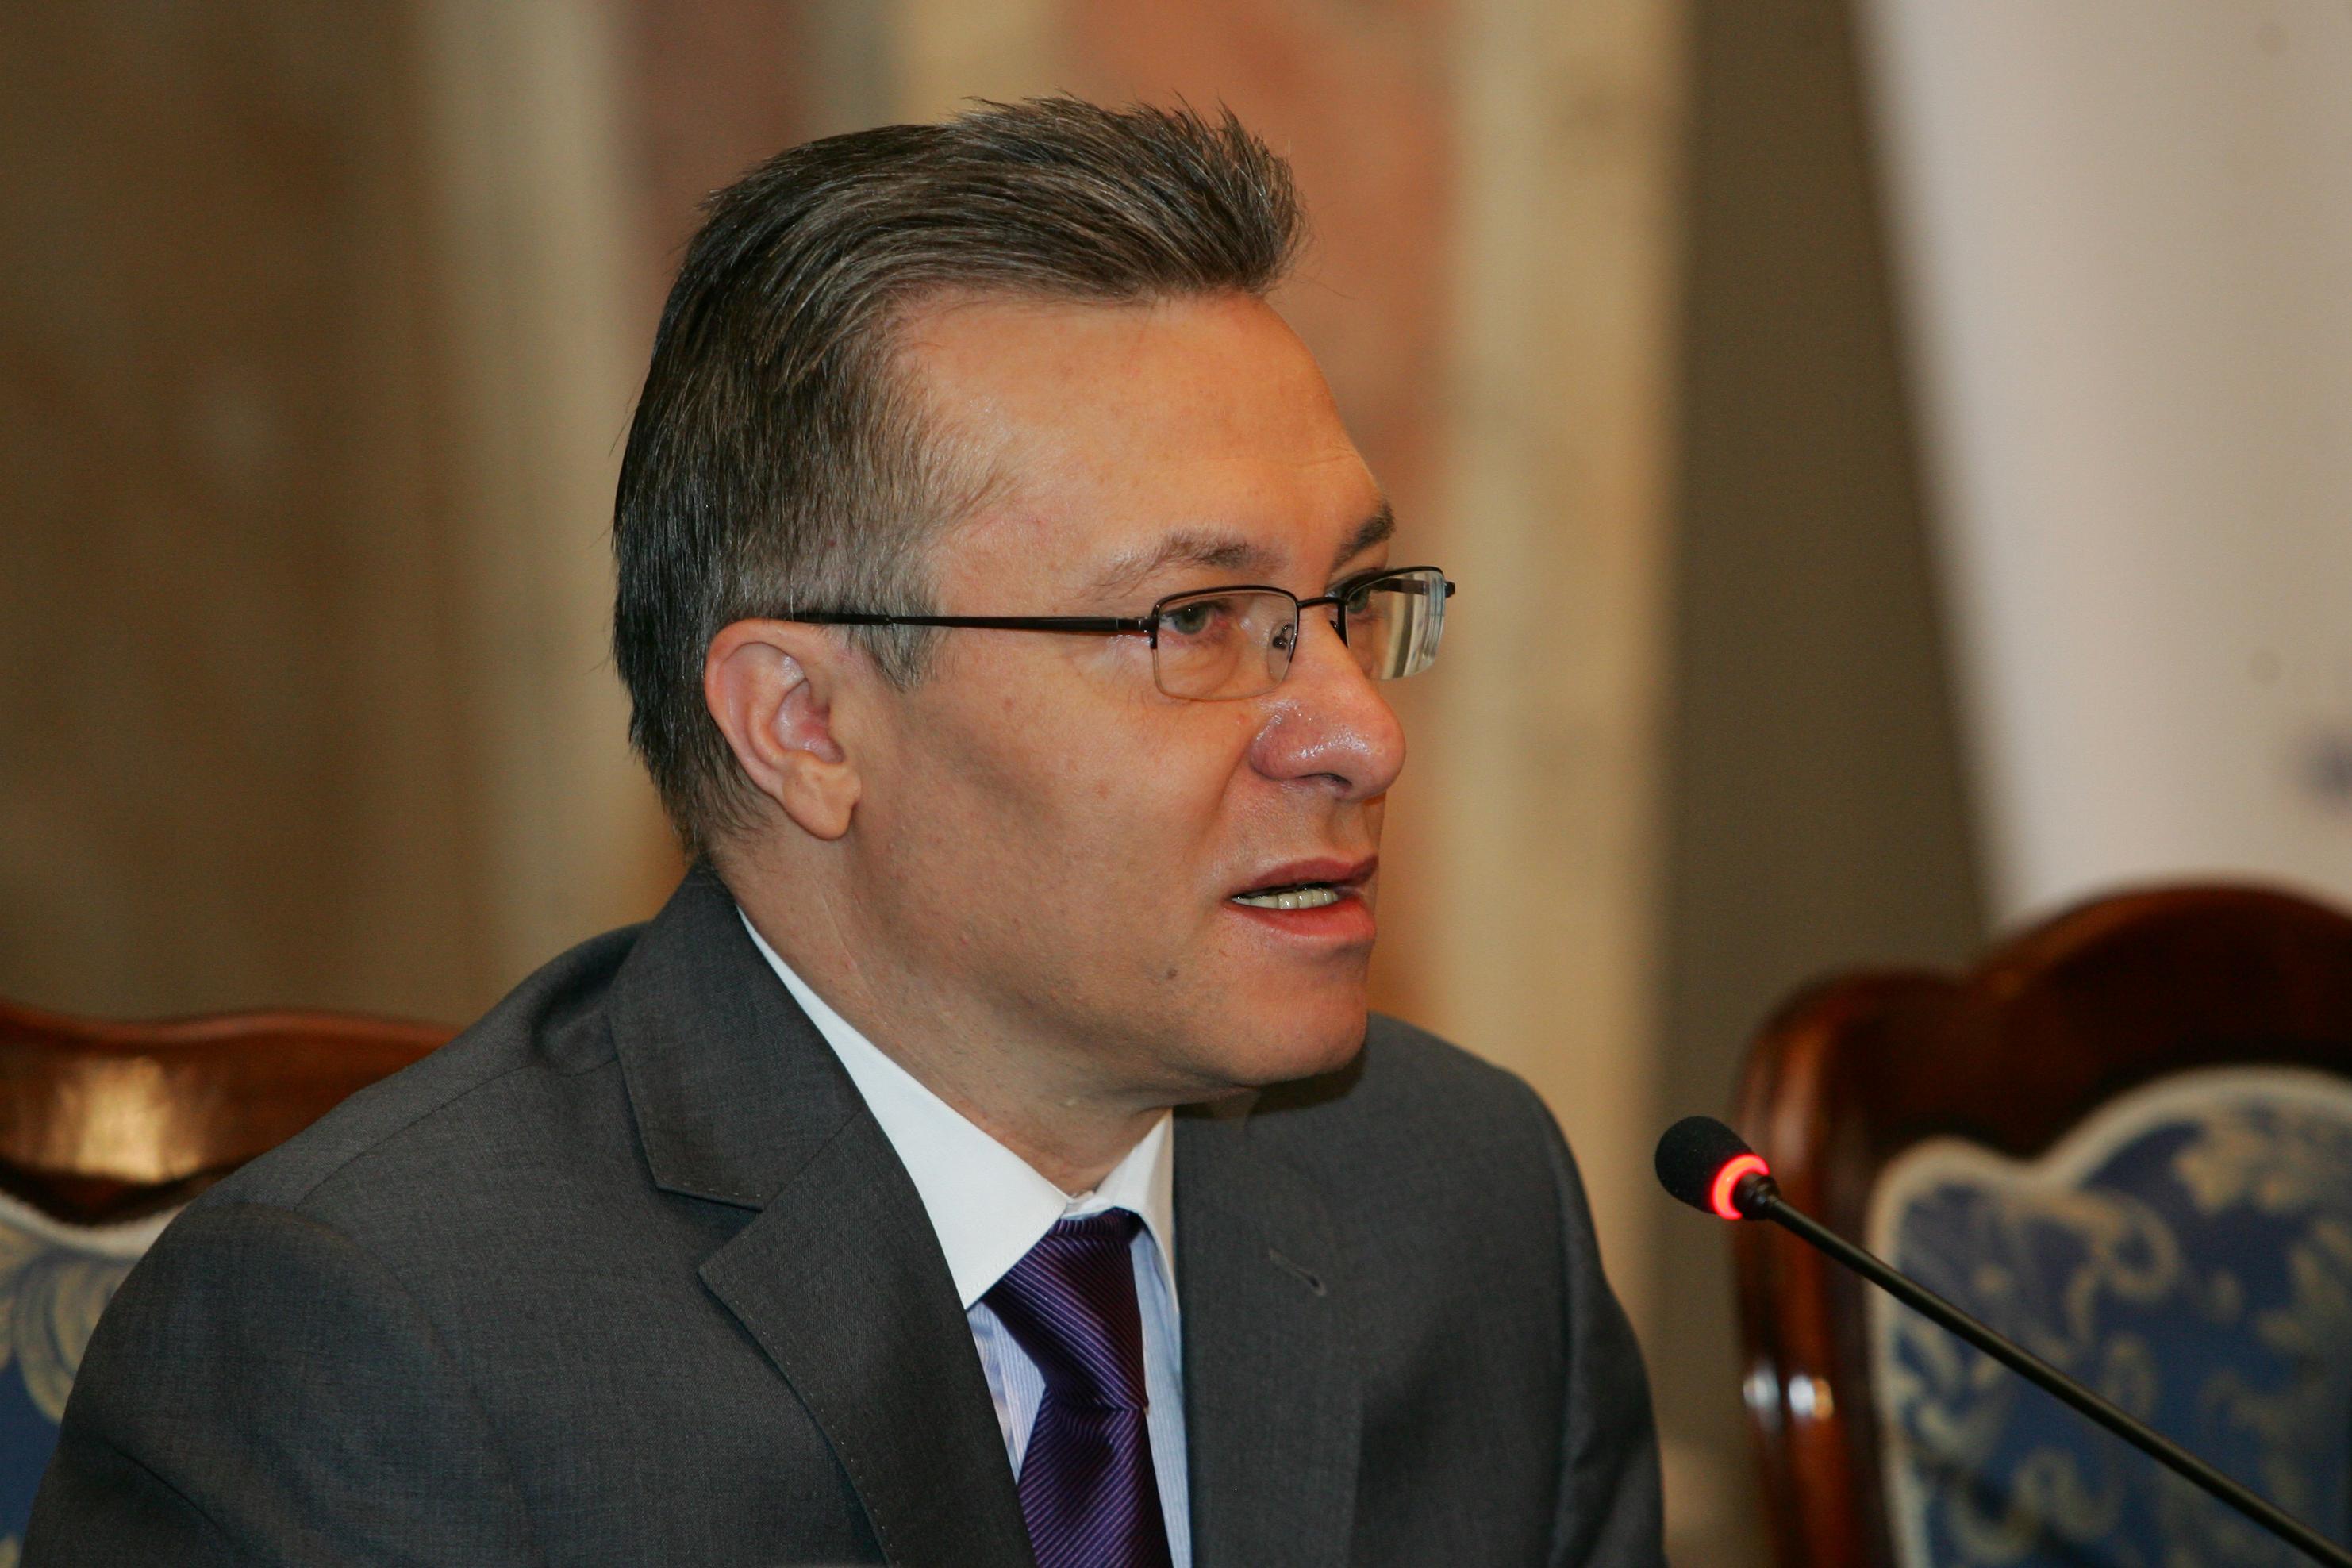 Cristian Diaconescu si-a anuntat plecarea din PMP si candidatura independenta la prezidentiale